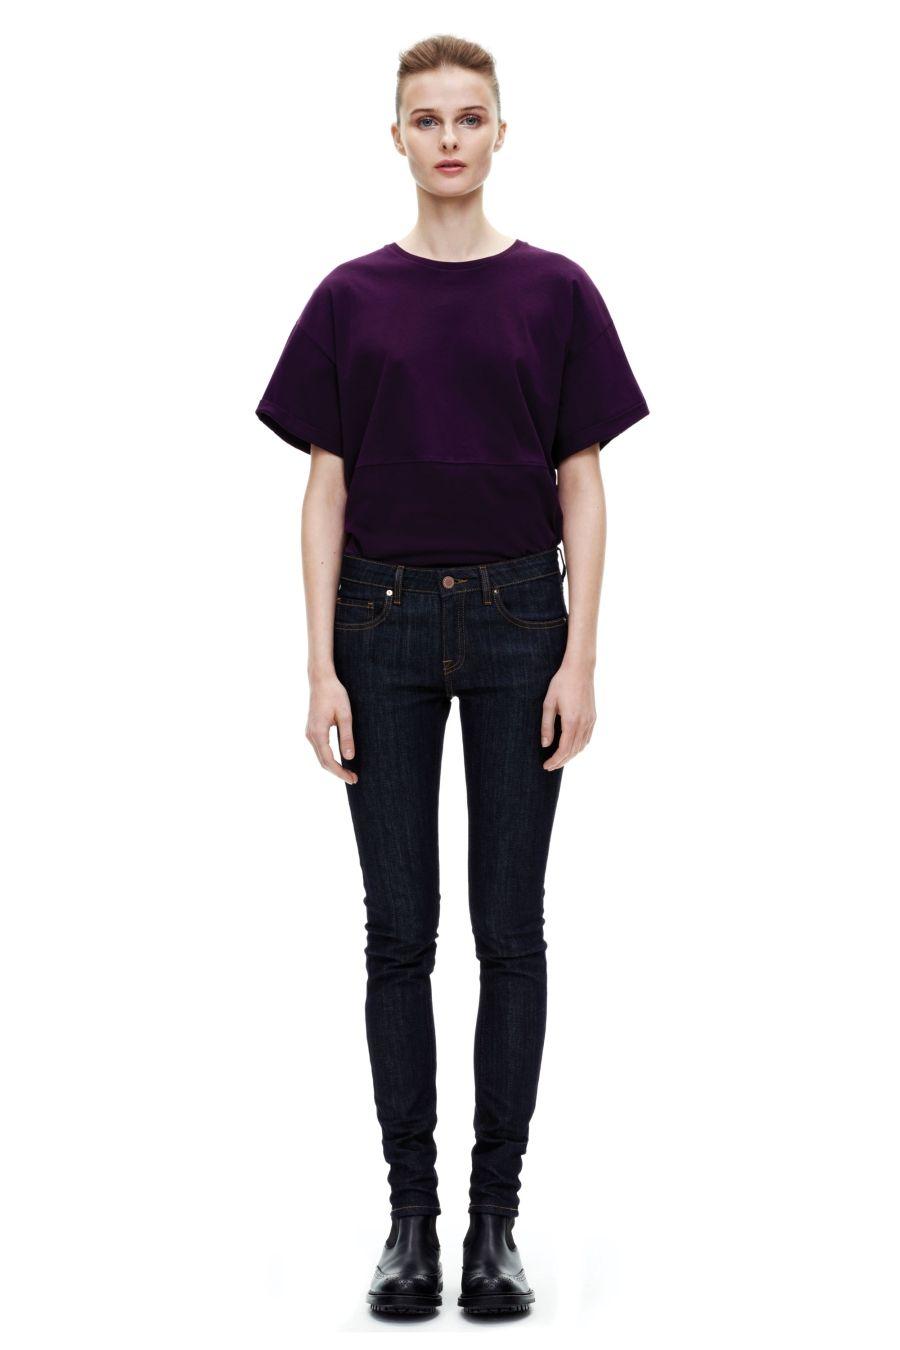 VictoriaBeckham-aw13_vbt87_royal_purple_1